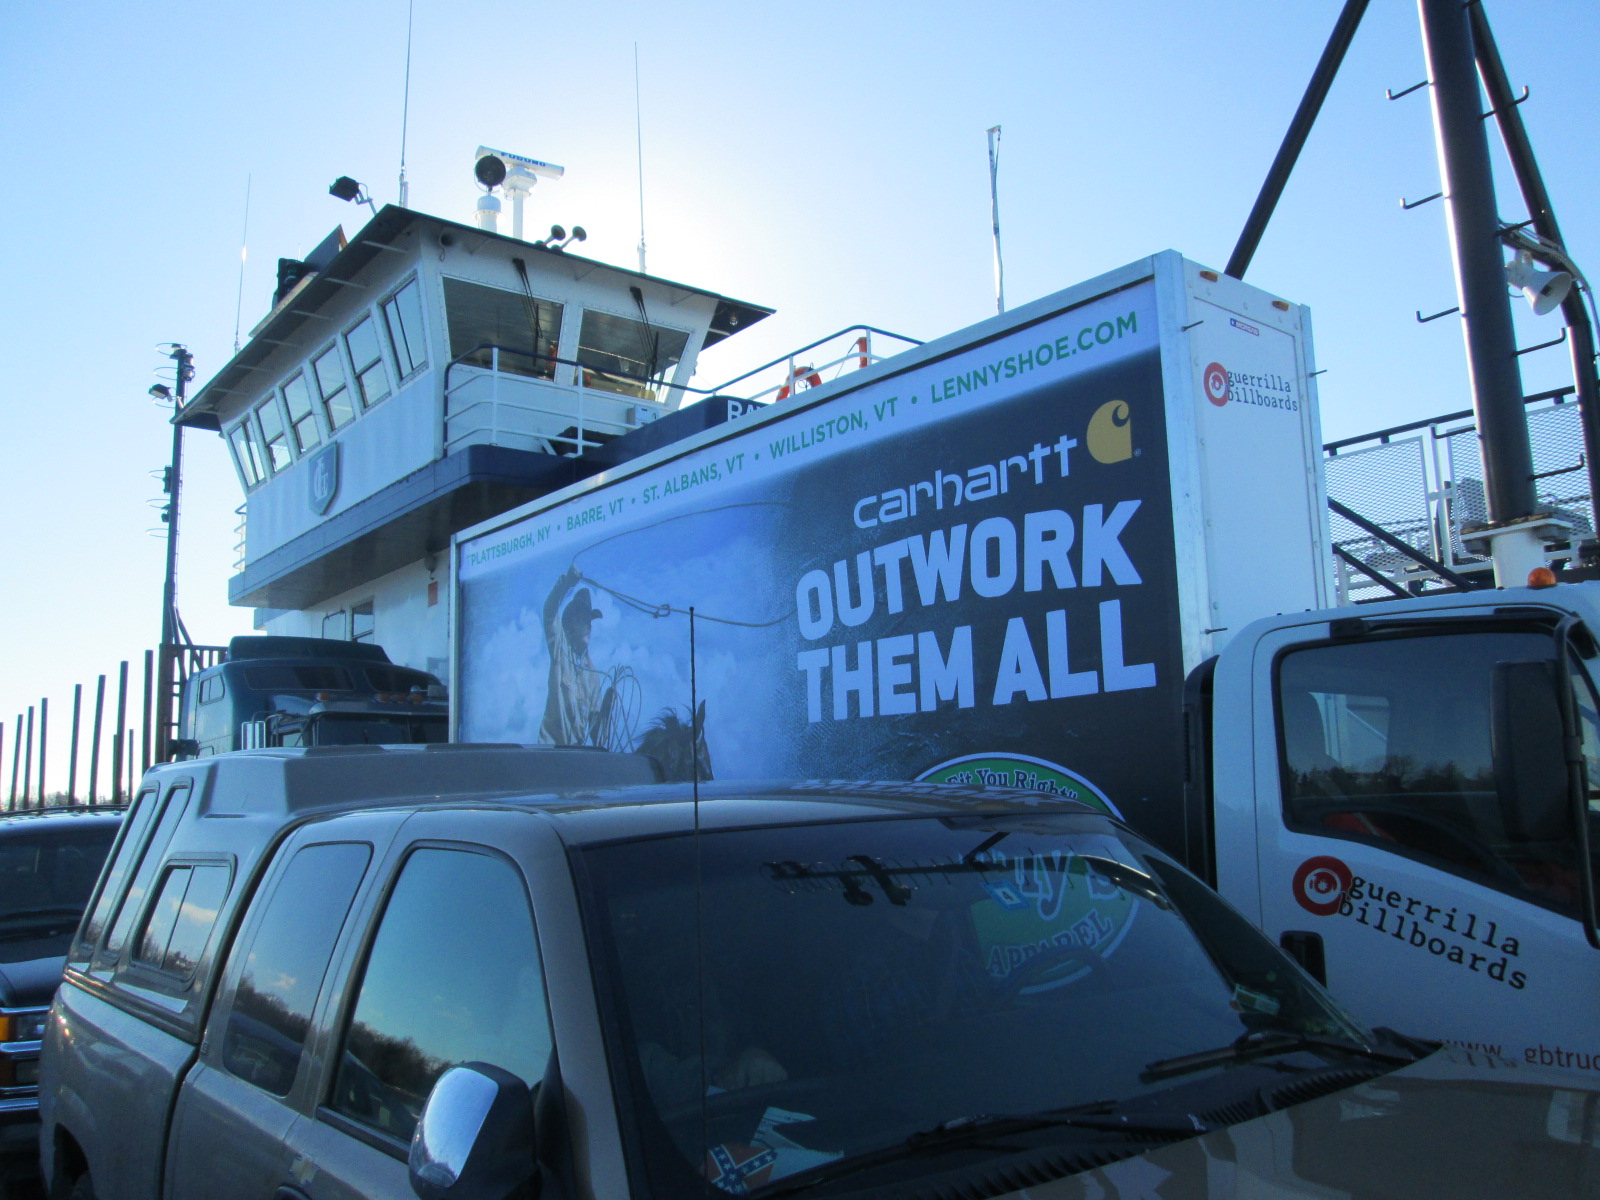 Mobile billboard truck aboard the Lake Champlain Ferry heading to Plattsburgh NY